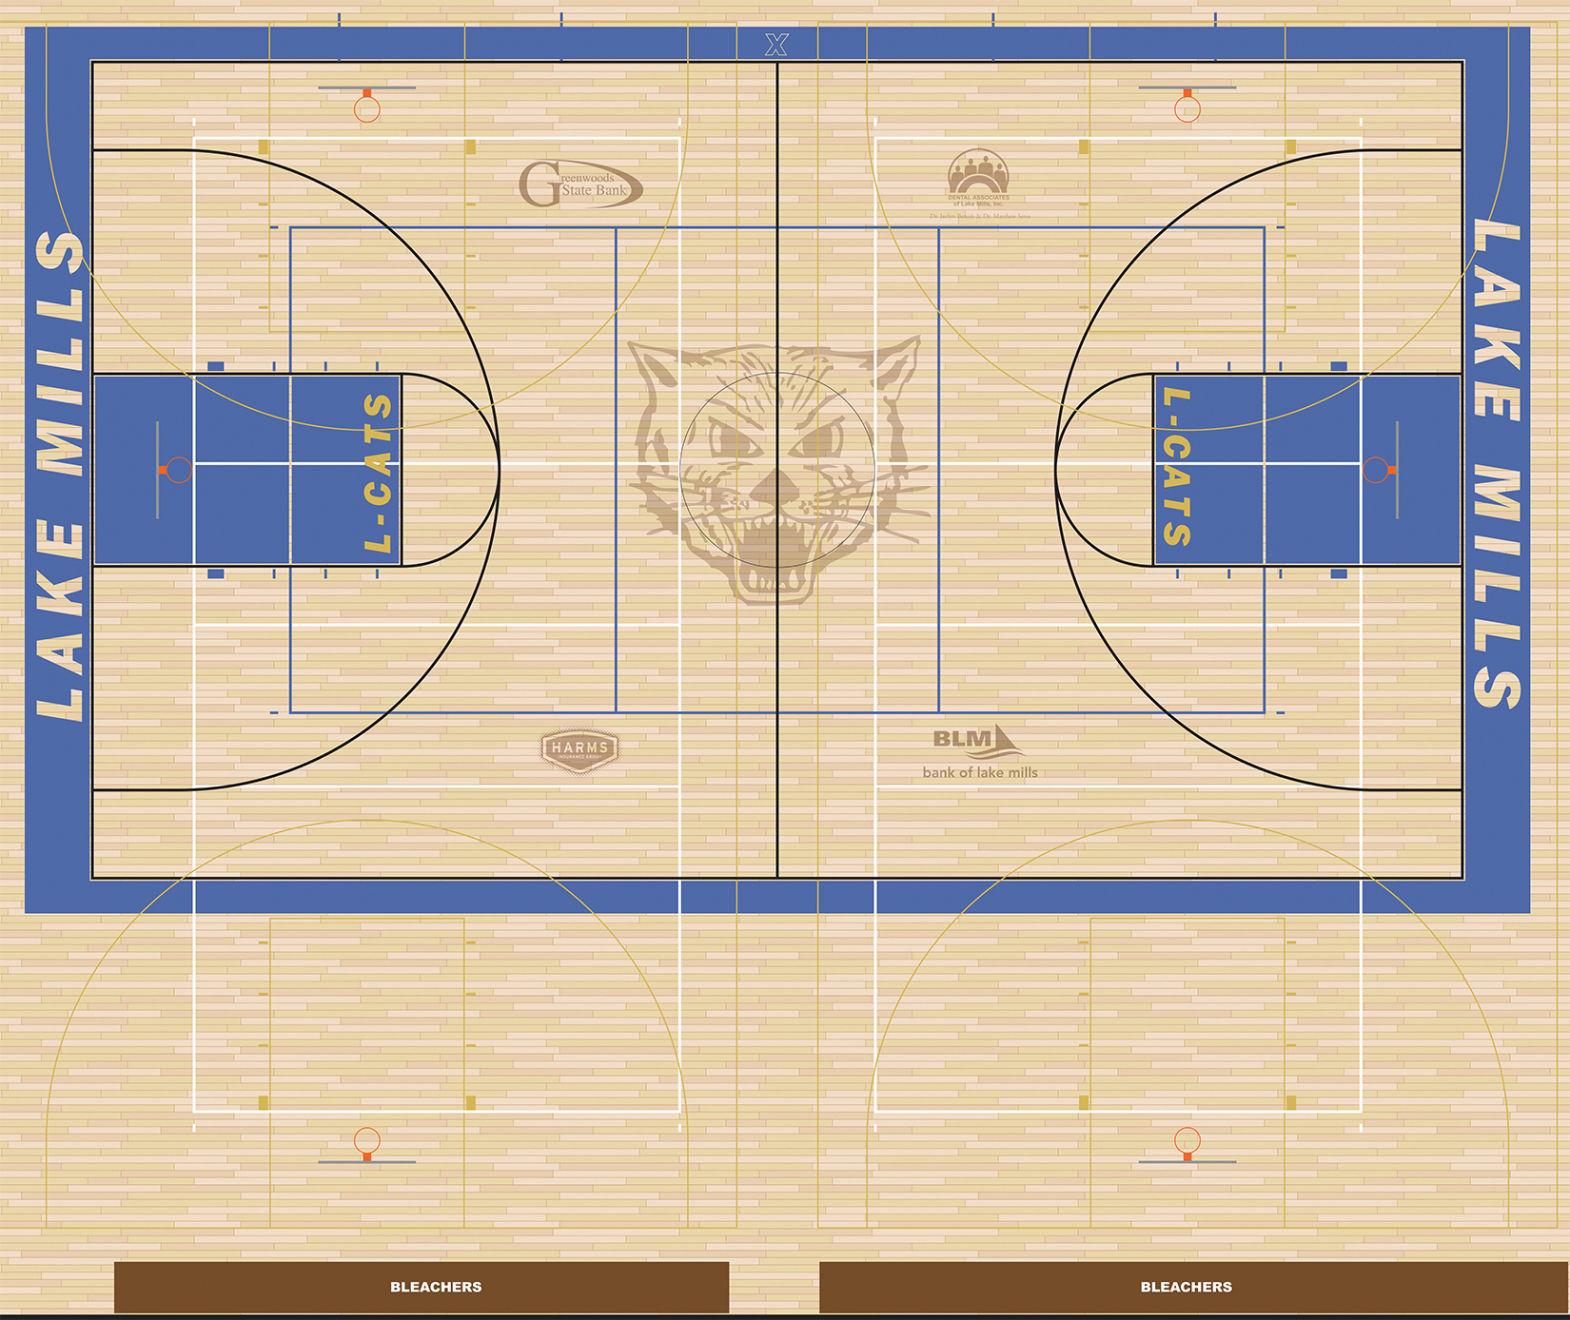 1570x1320 Lmasd Board Approves New High School Gym Floor